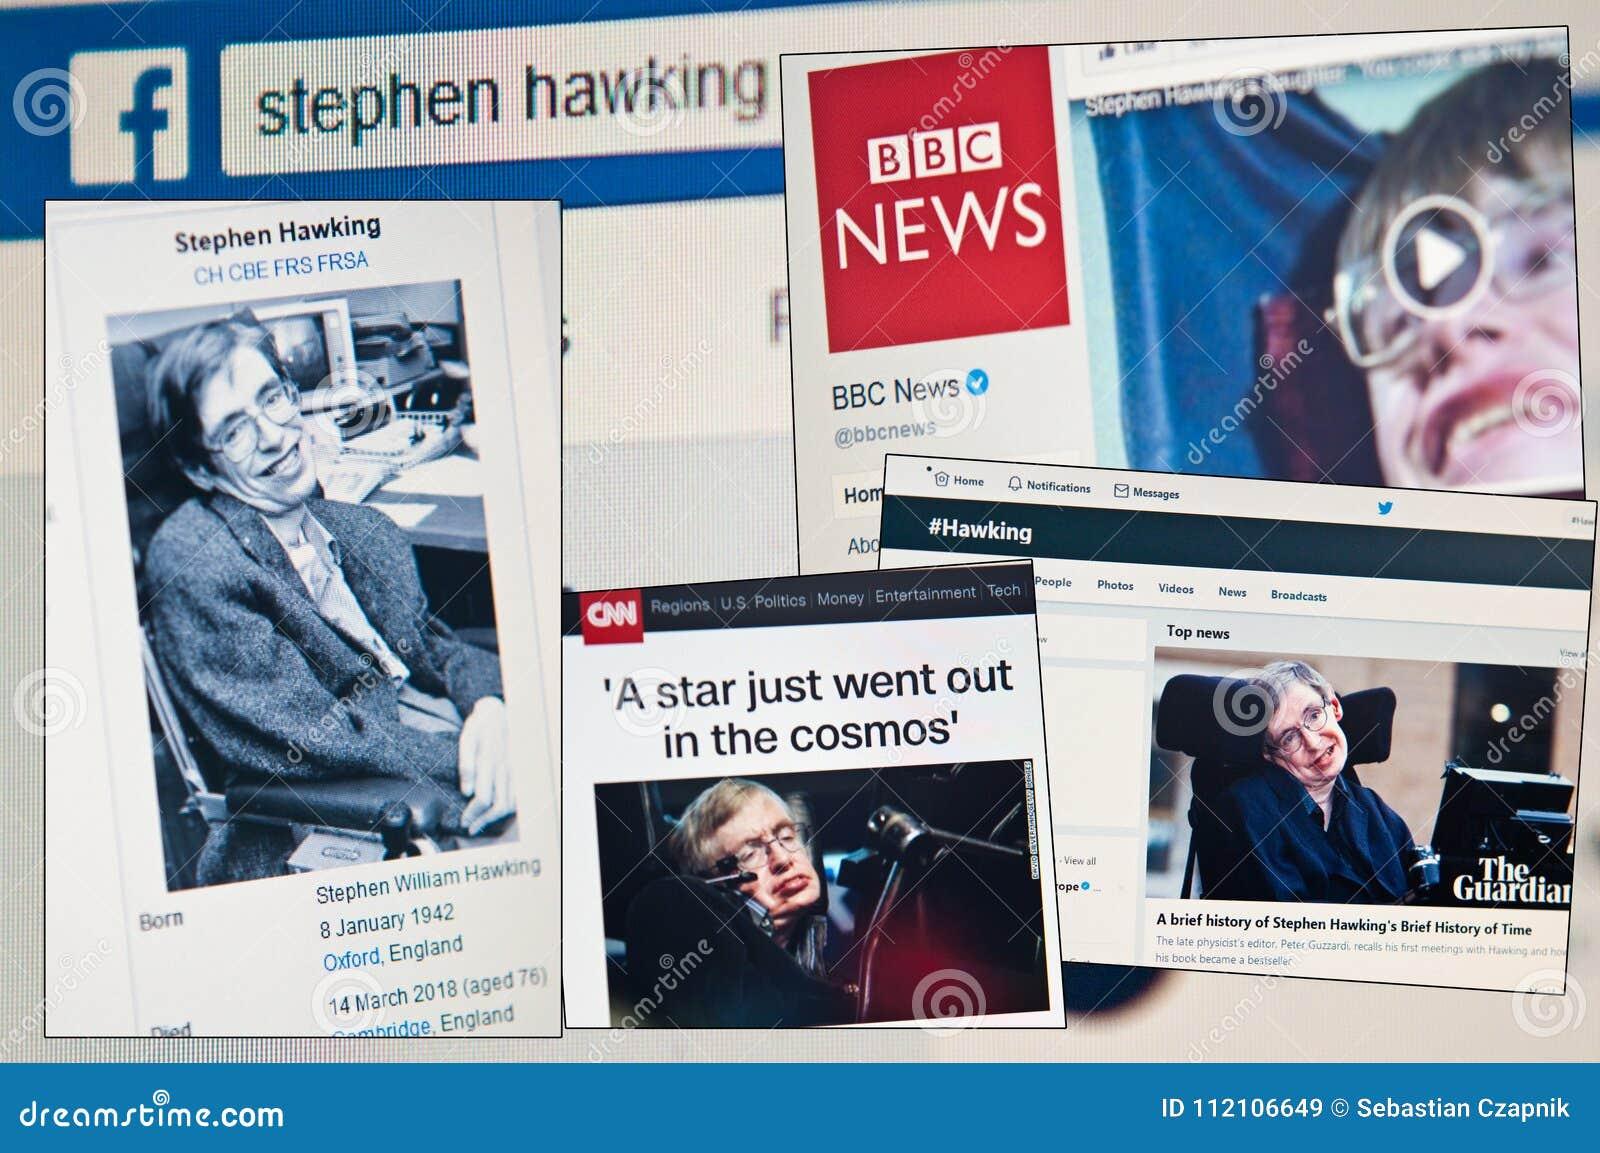 Dadi di Stephen Hawking invecchiati 76